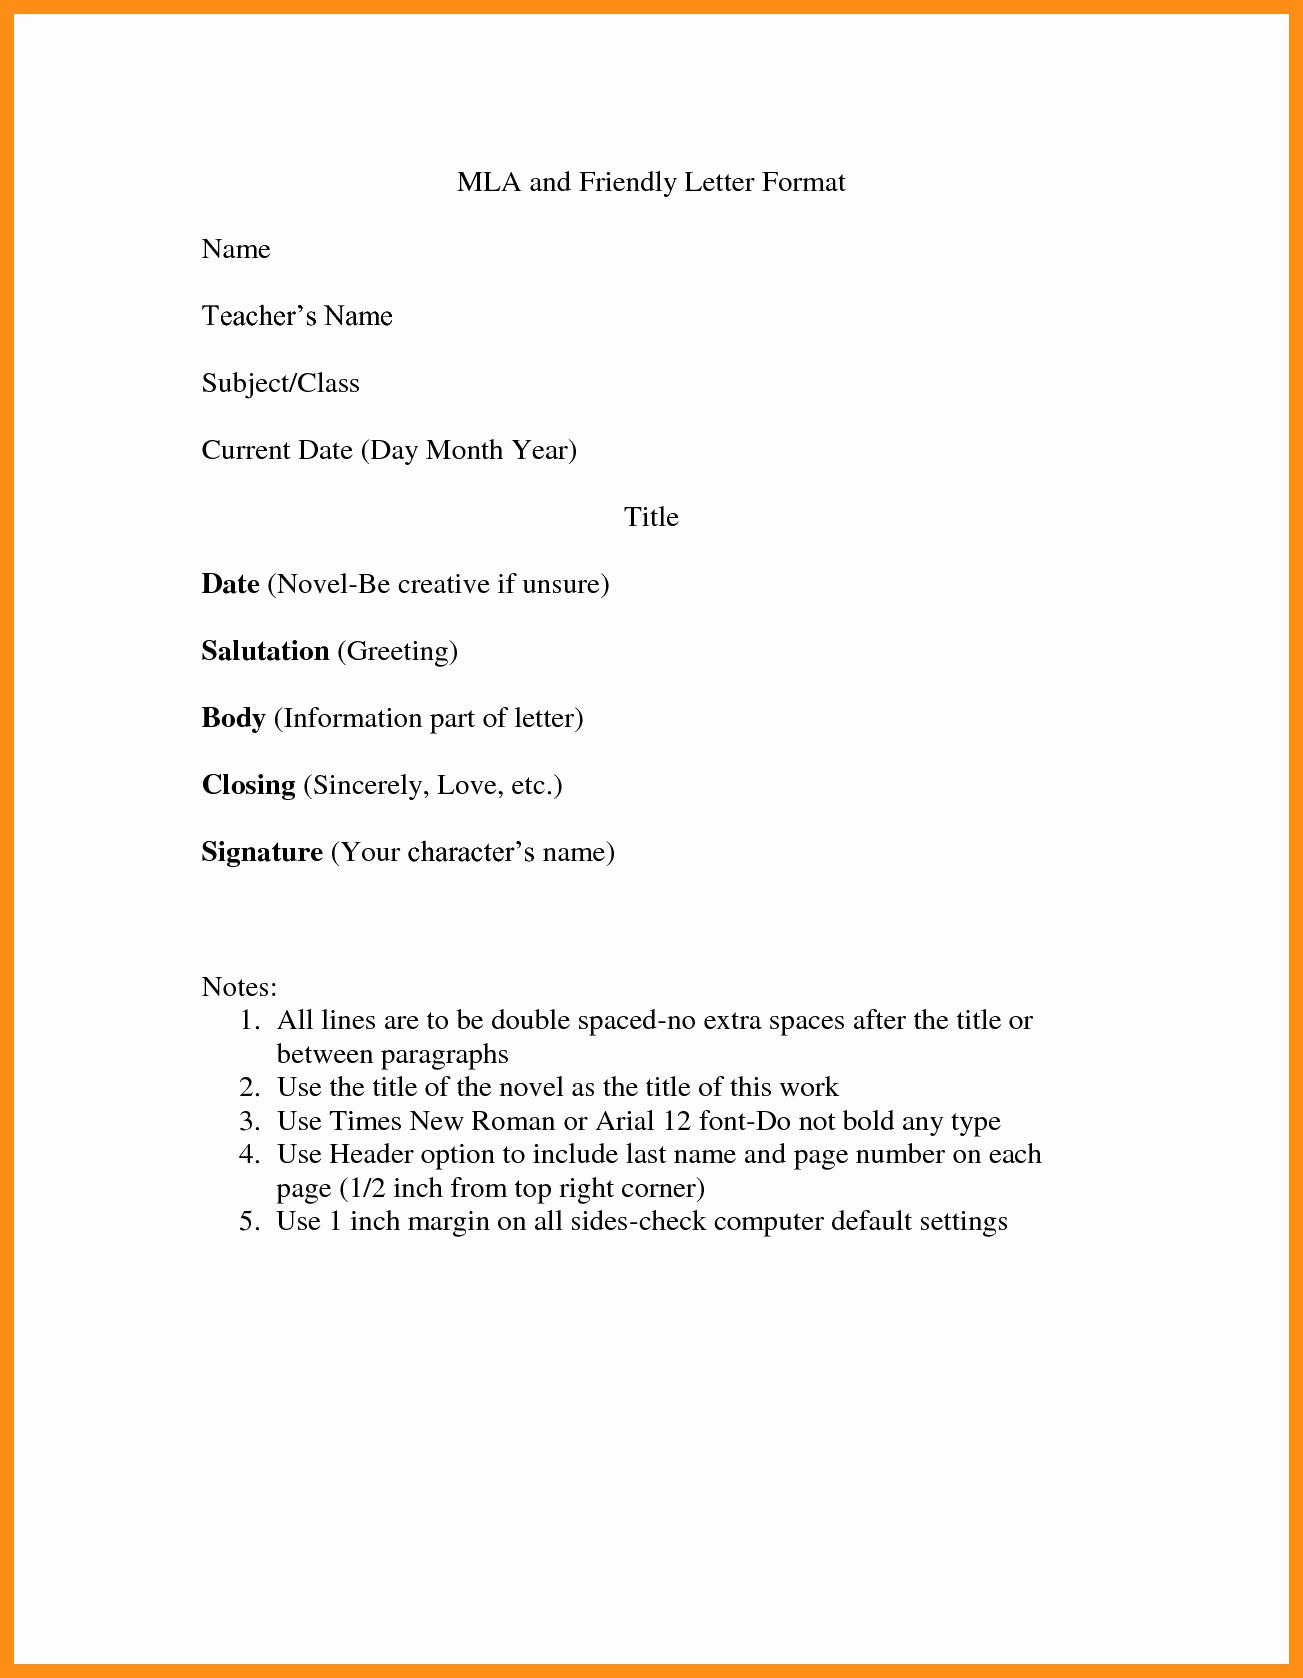 Purdue Owl Letter format Luxury Friendly Business Letter format